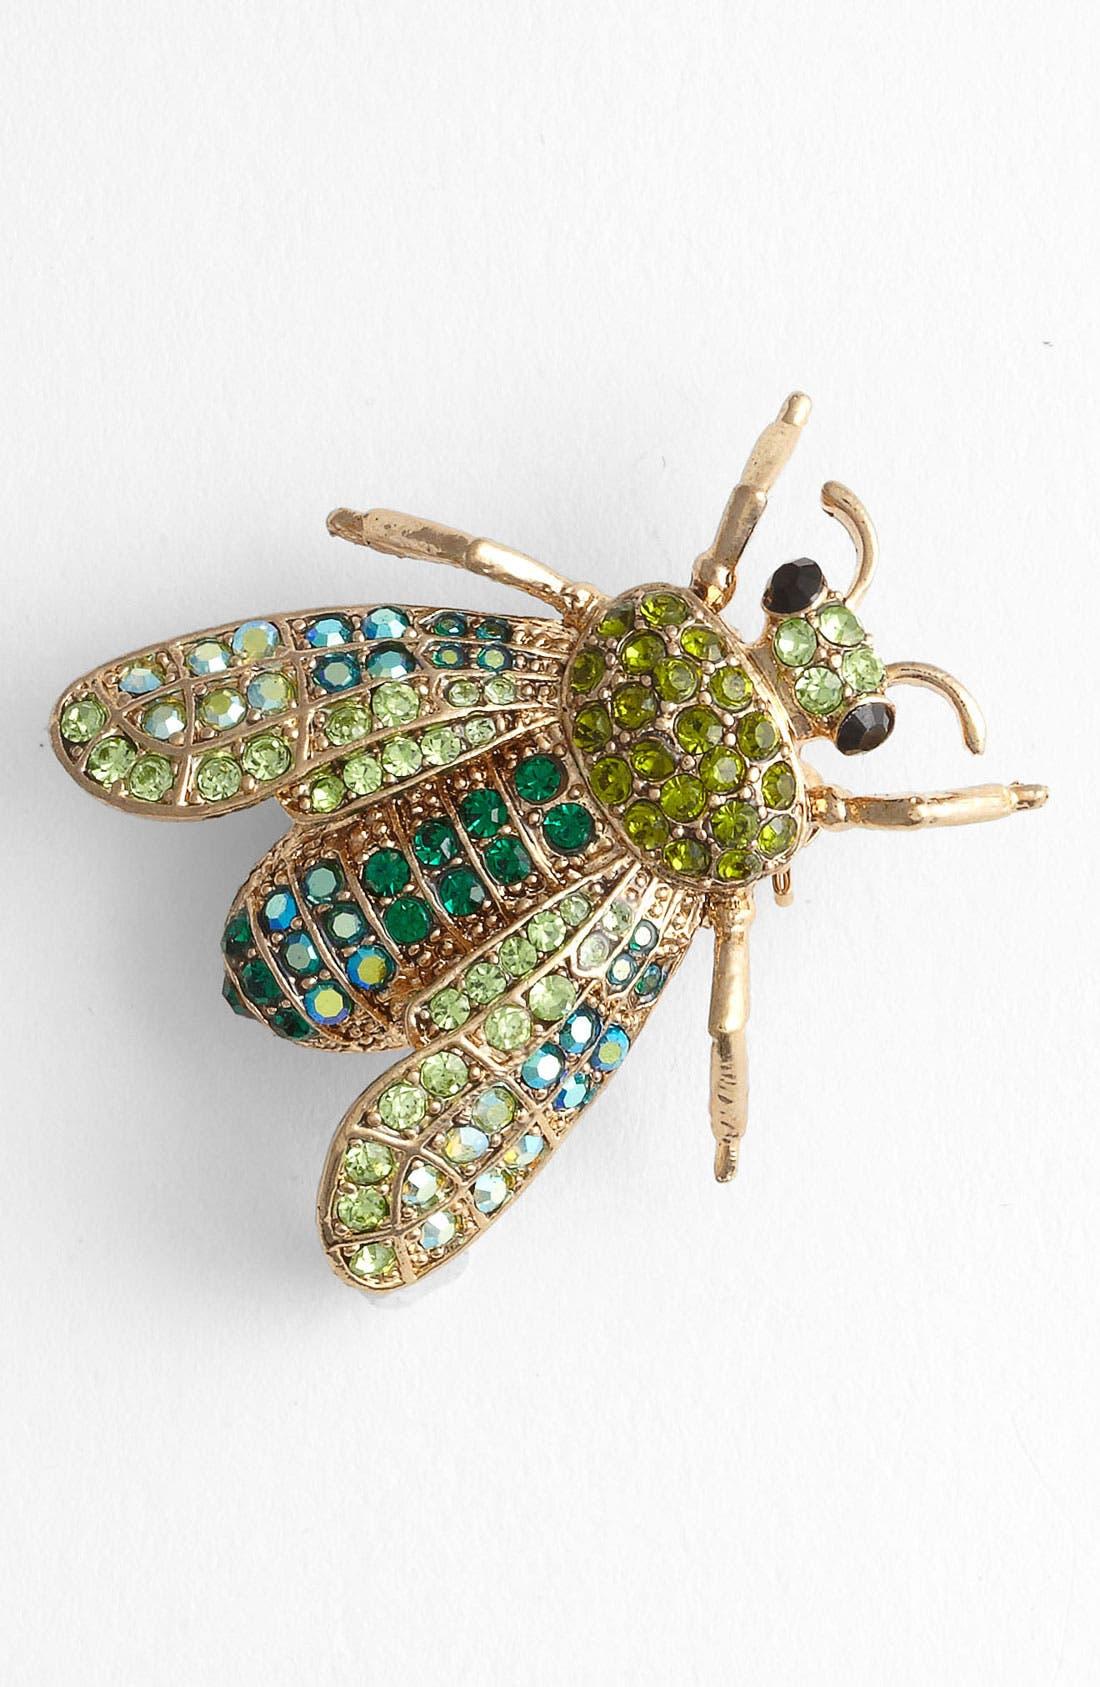 Main Image - Tasha 'Critters' Fly Brooch